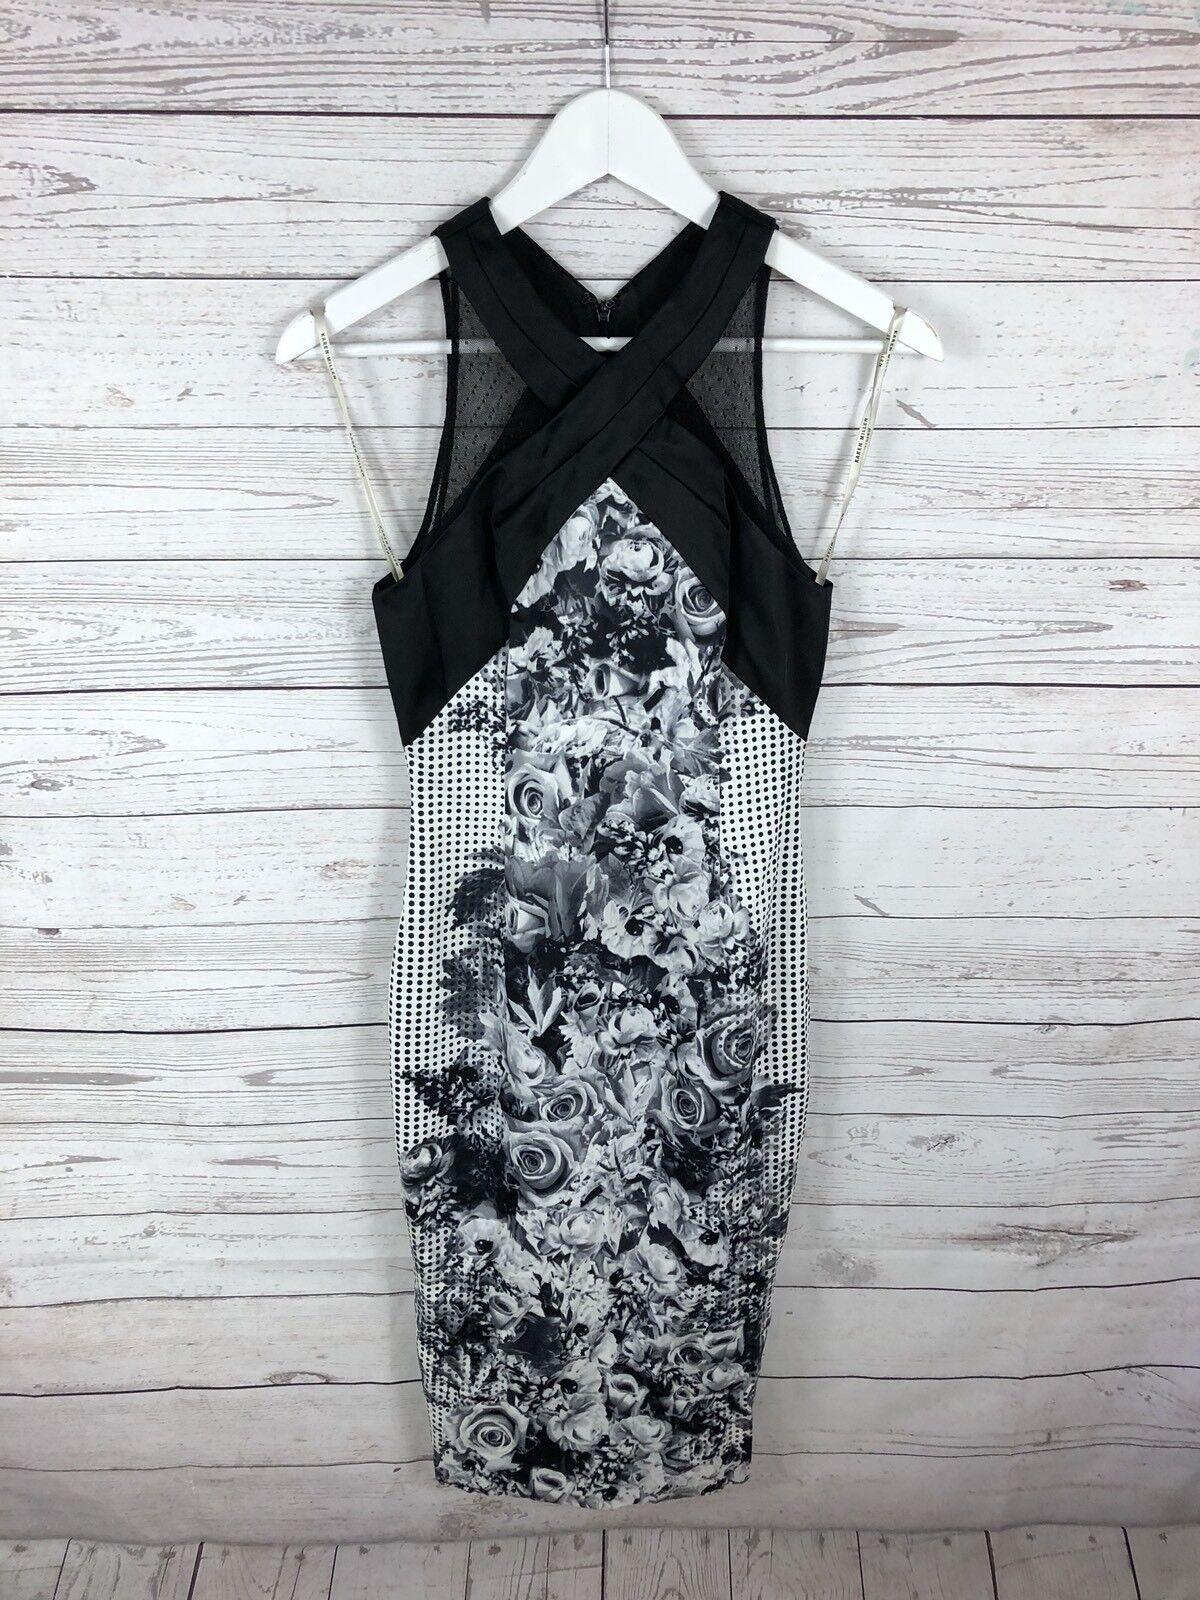 KAREN MILLEN Party Dress - Größe UK8 - Spotty - Great Condition - damen's